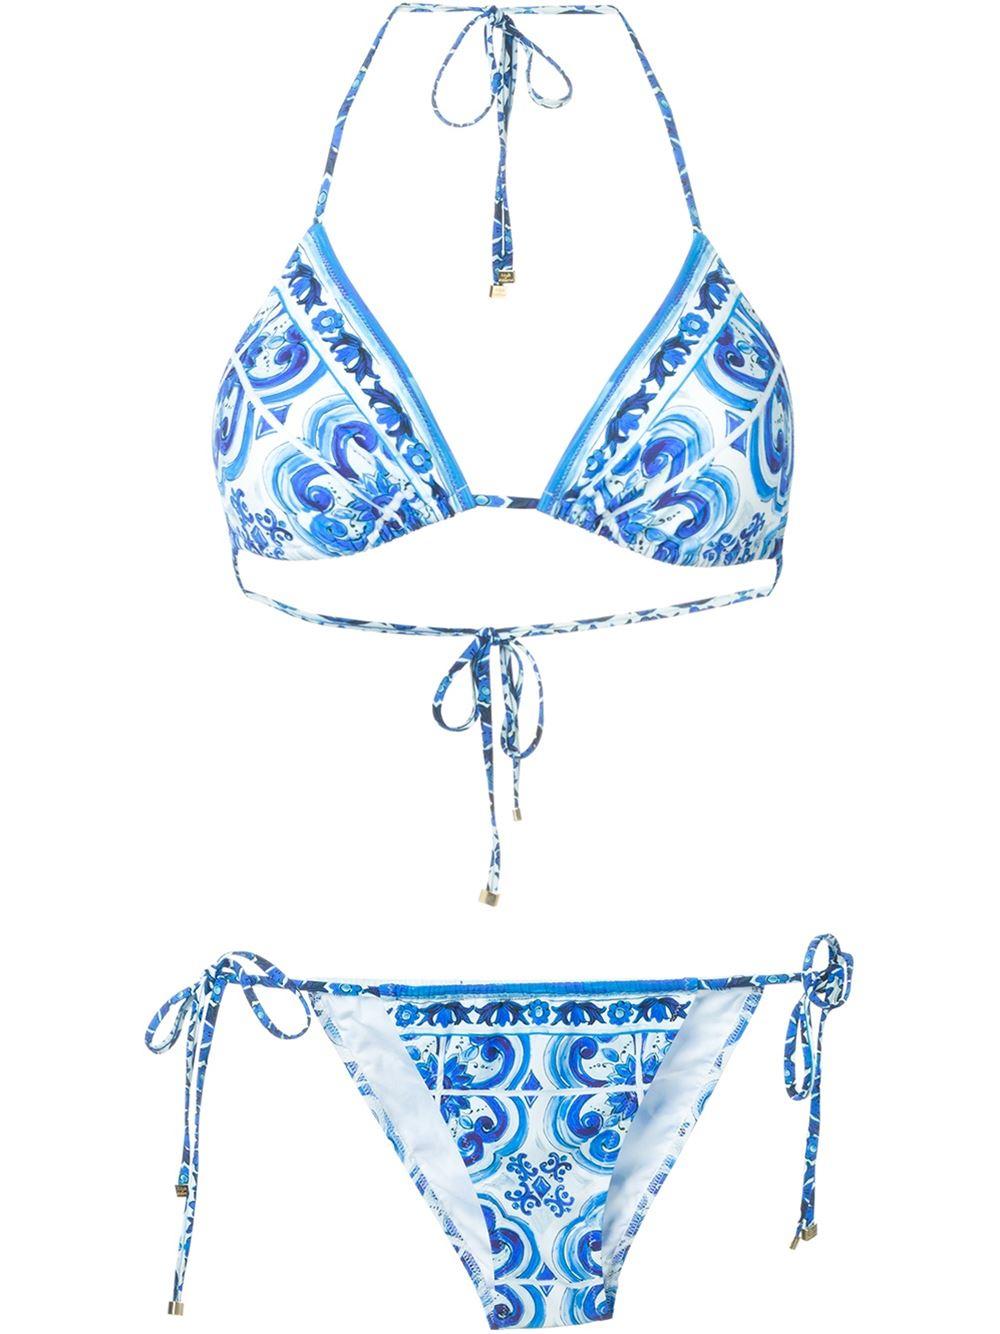 3e7443e09c64ef Dolce & Gabbana Majolica Print Bikini in Blue - Lyst